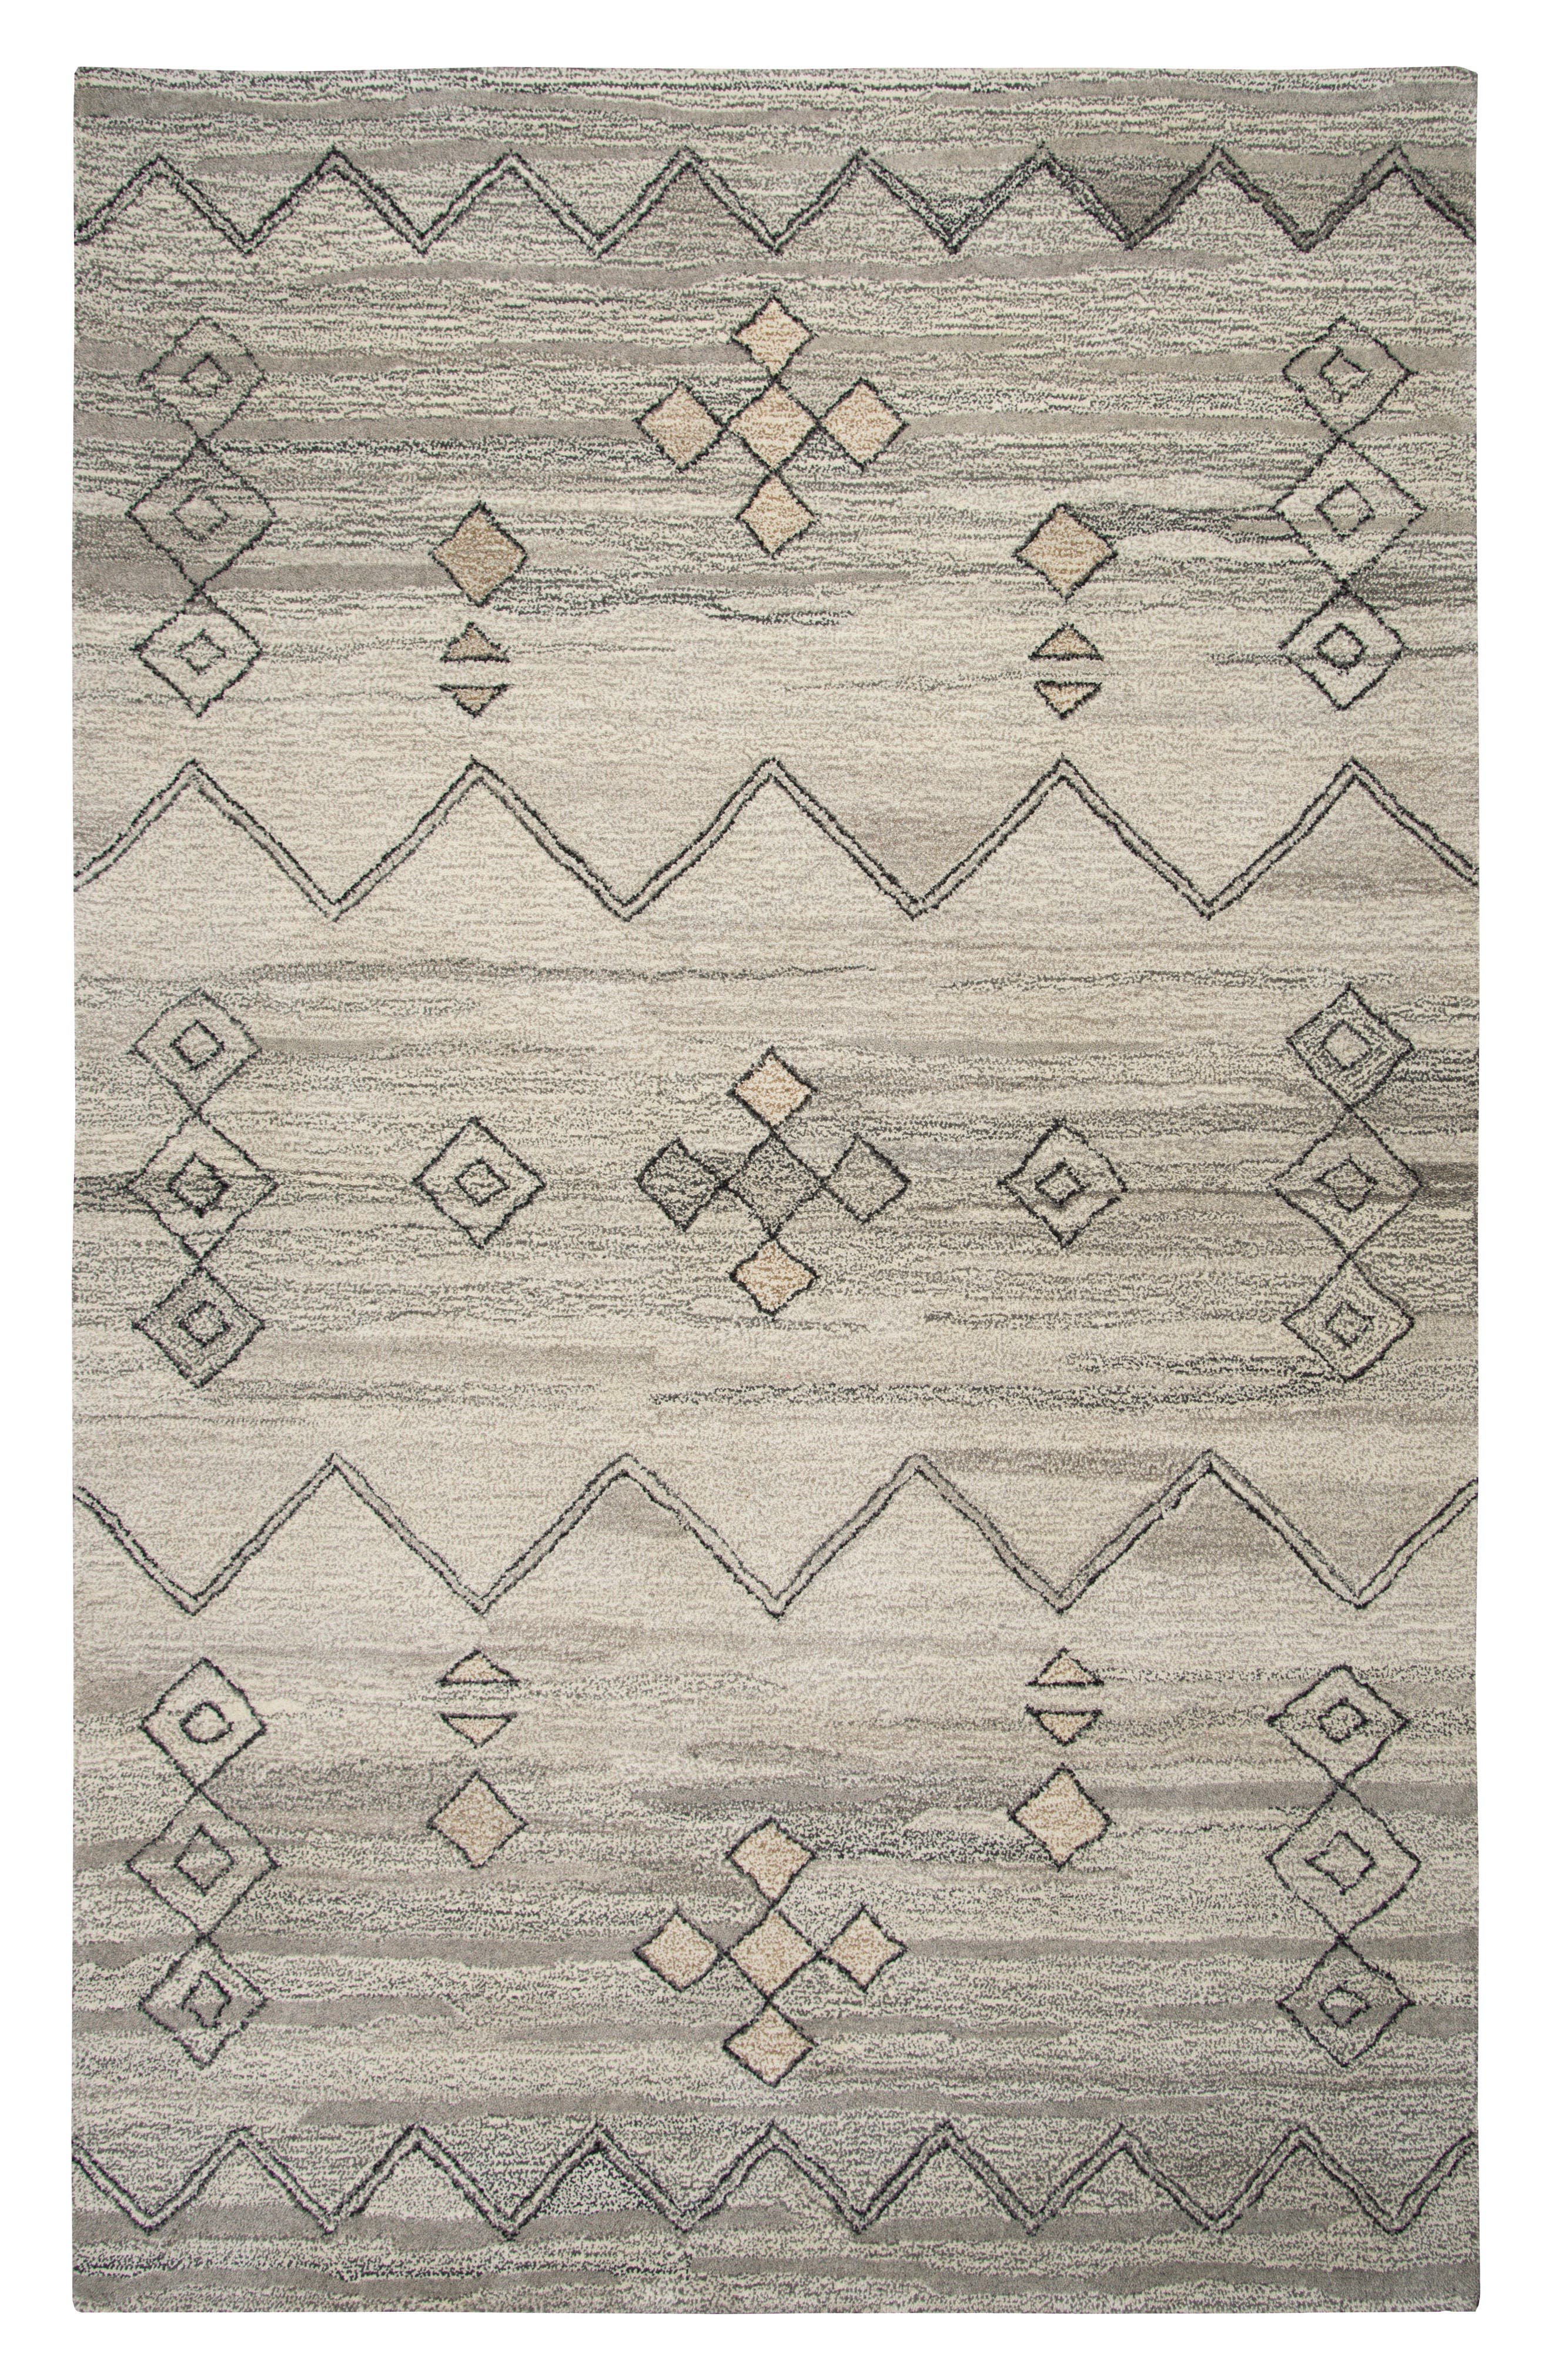 Desert Plains Hand Tufted Wool Area Rug,                             Main thumbnail 1, color,                             020